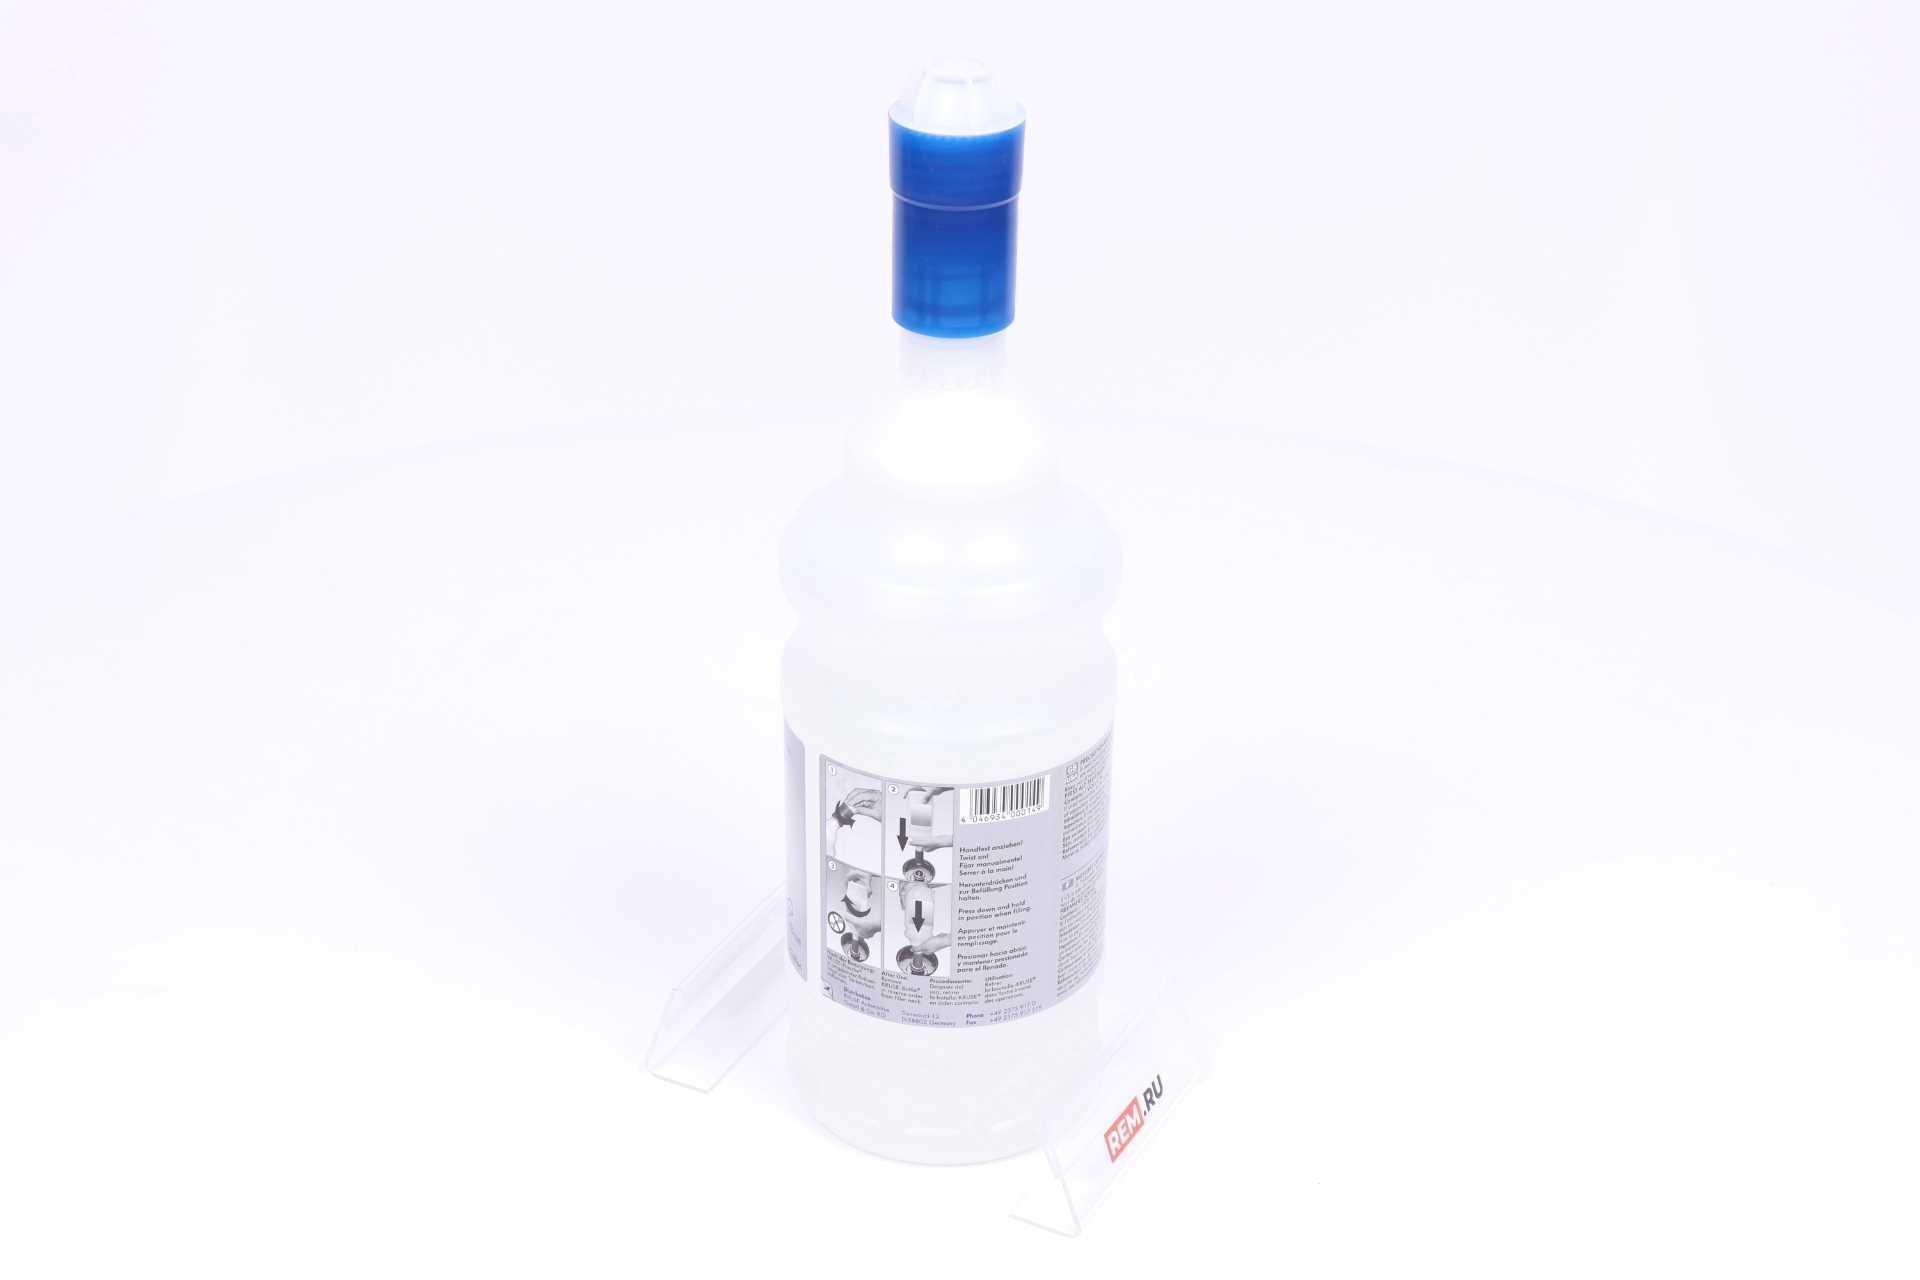 Жидкость AdBlue (мочевина), 1.89Л A0005830107